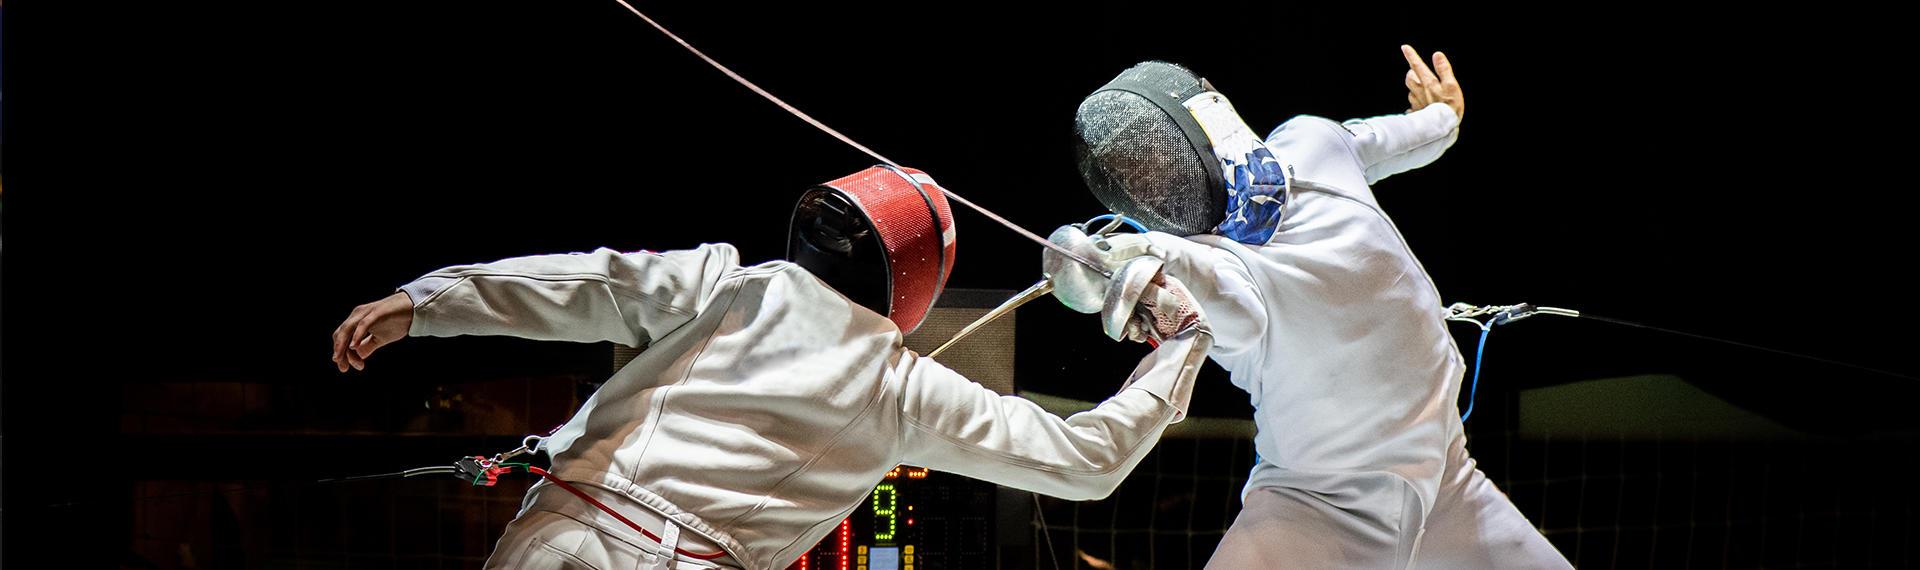 Sven Vineis, Fencing - private bank Bonhôte